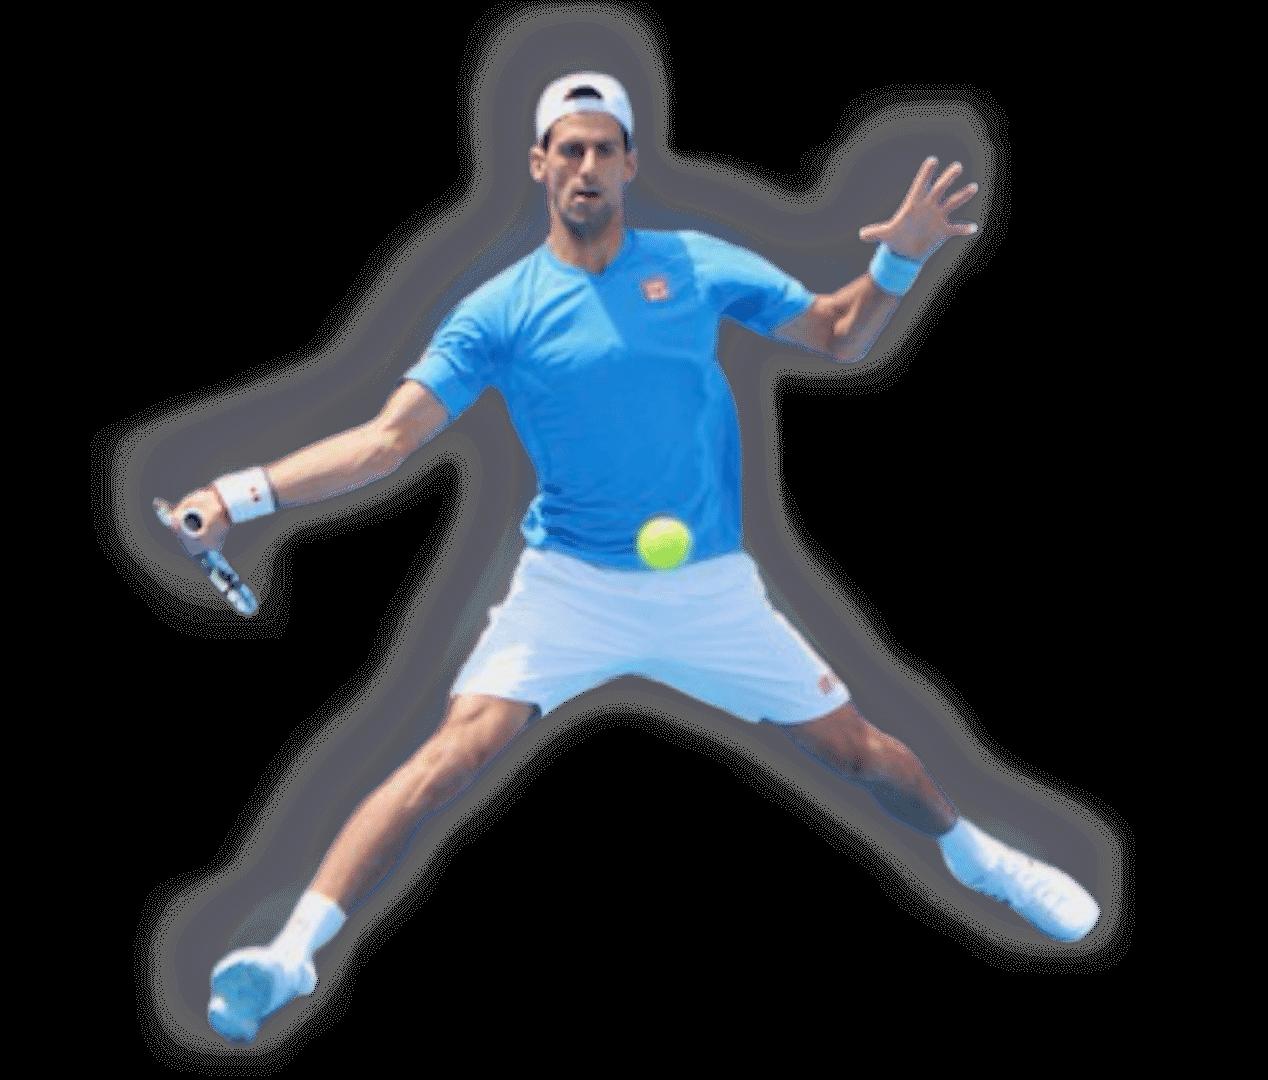 benefits-tennis-yoga,-mobility-injury-prevention